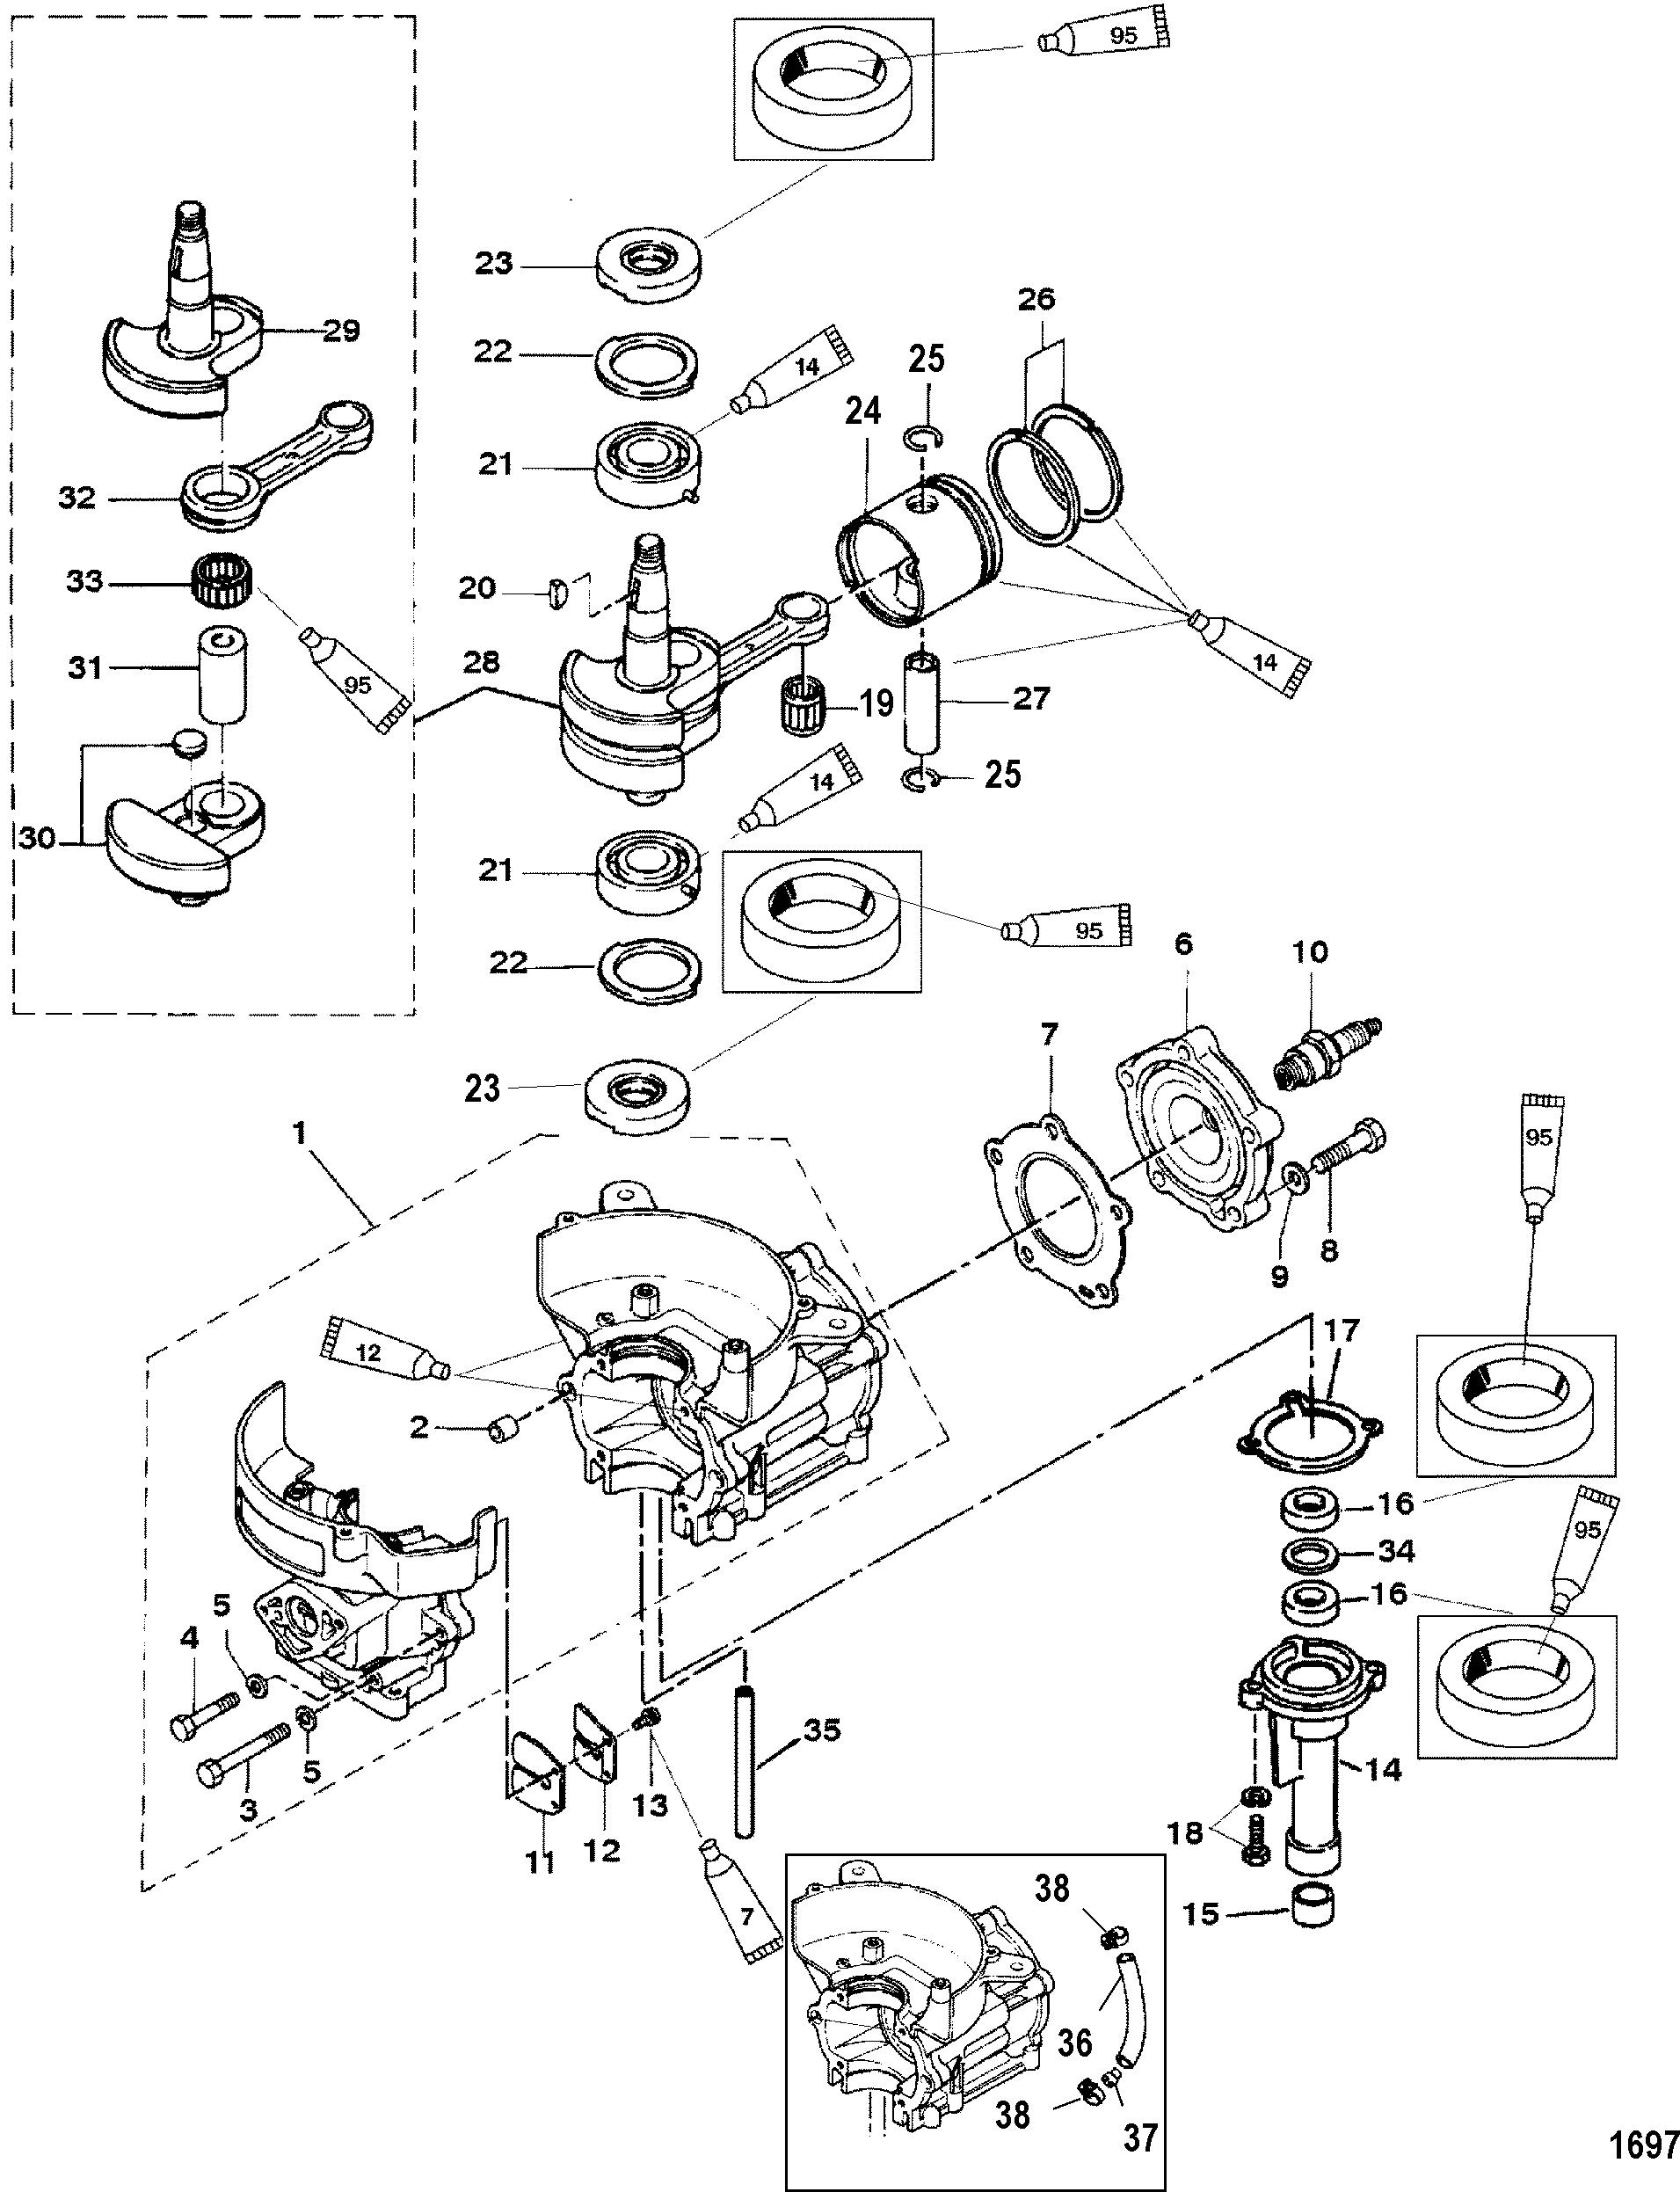 Cylinder Block Crankshaft Piston For Mariner Mercury 4 5hp 2 Stroke